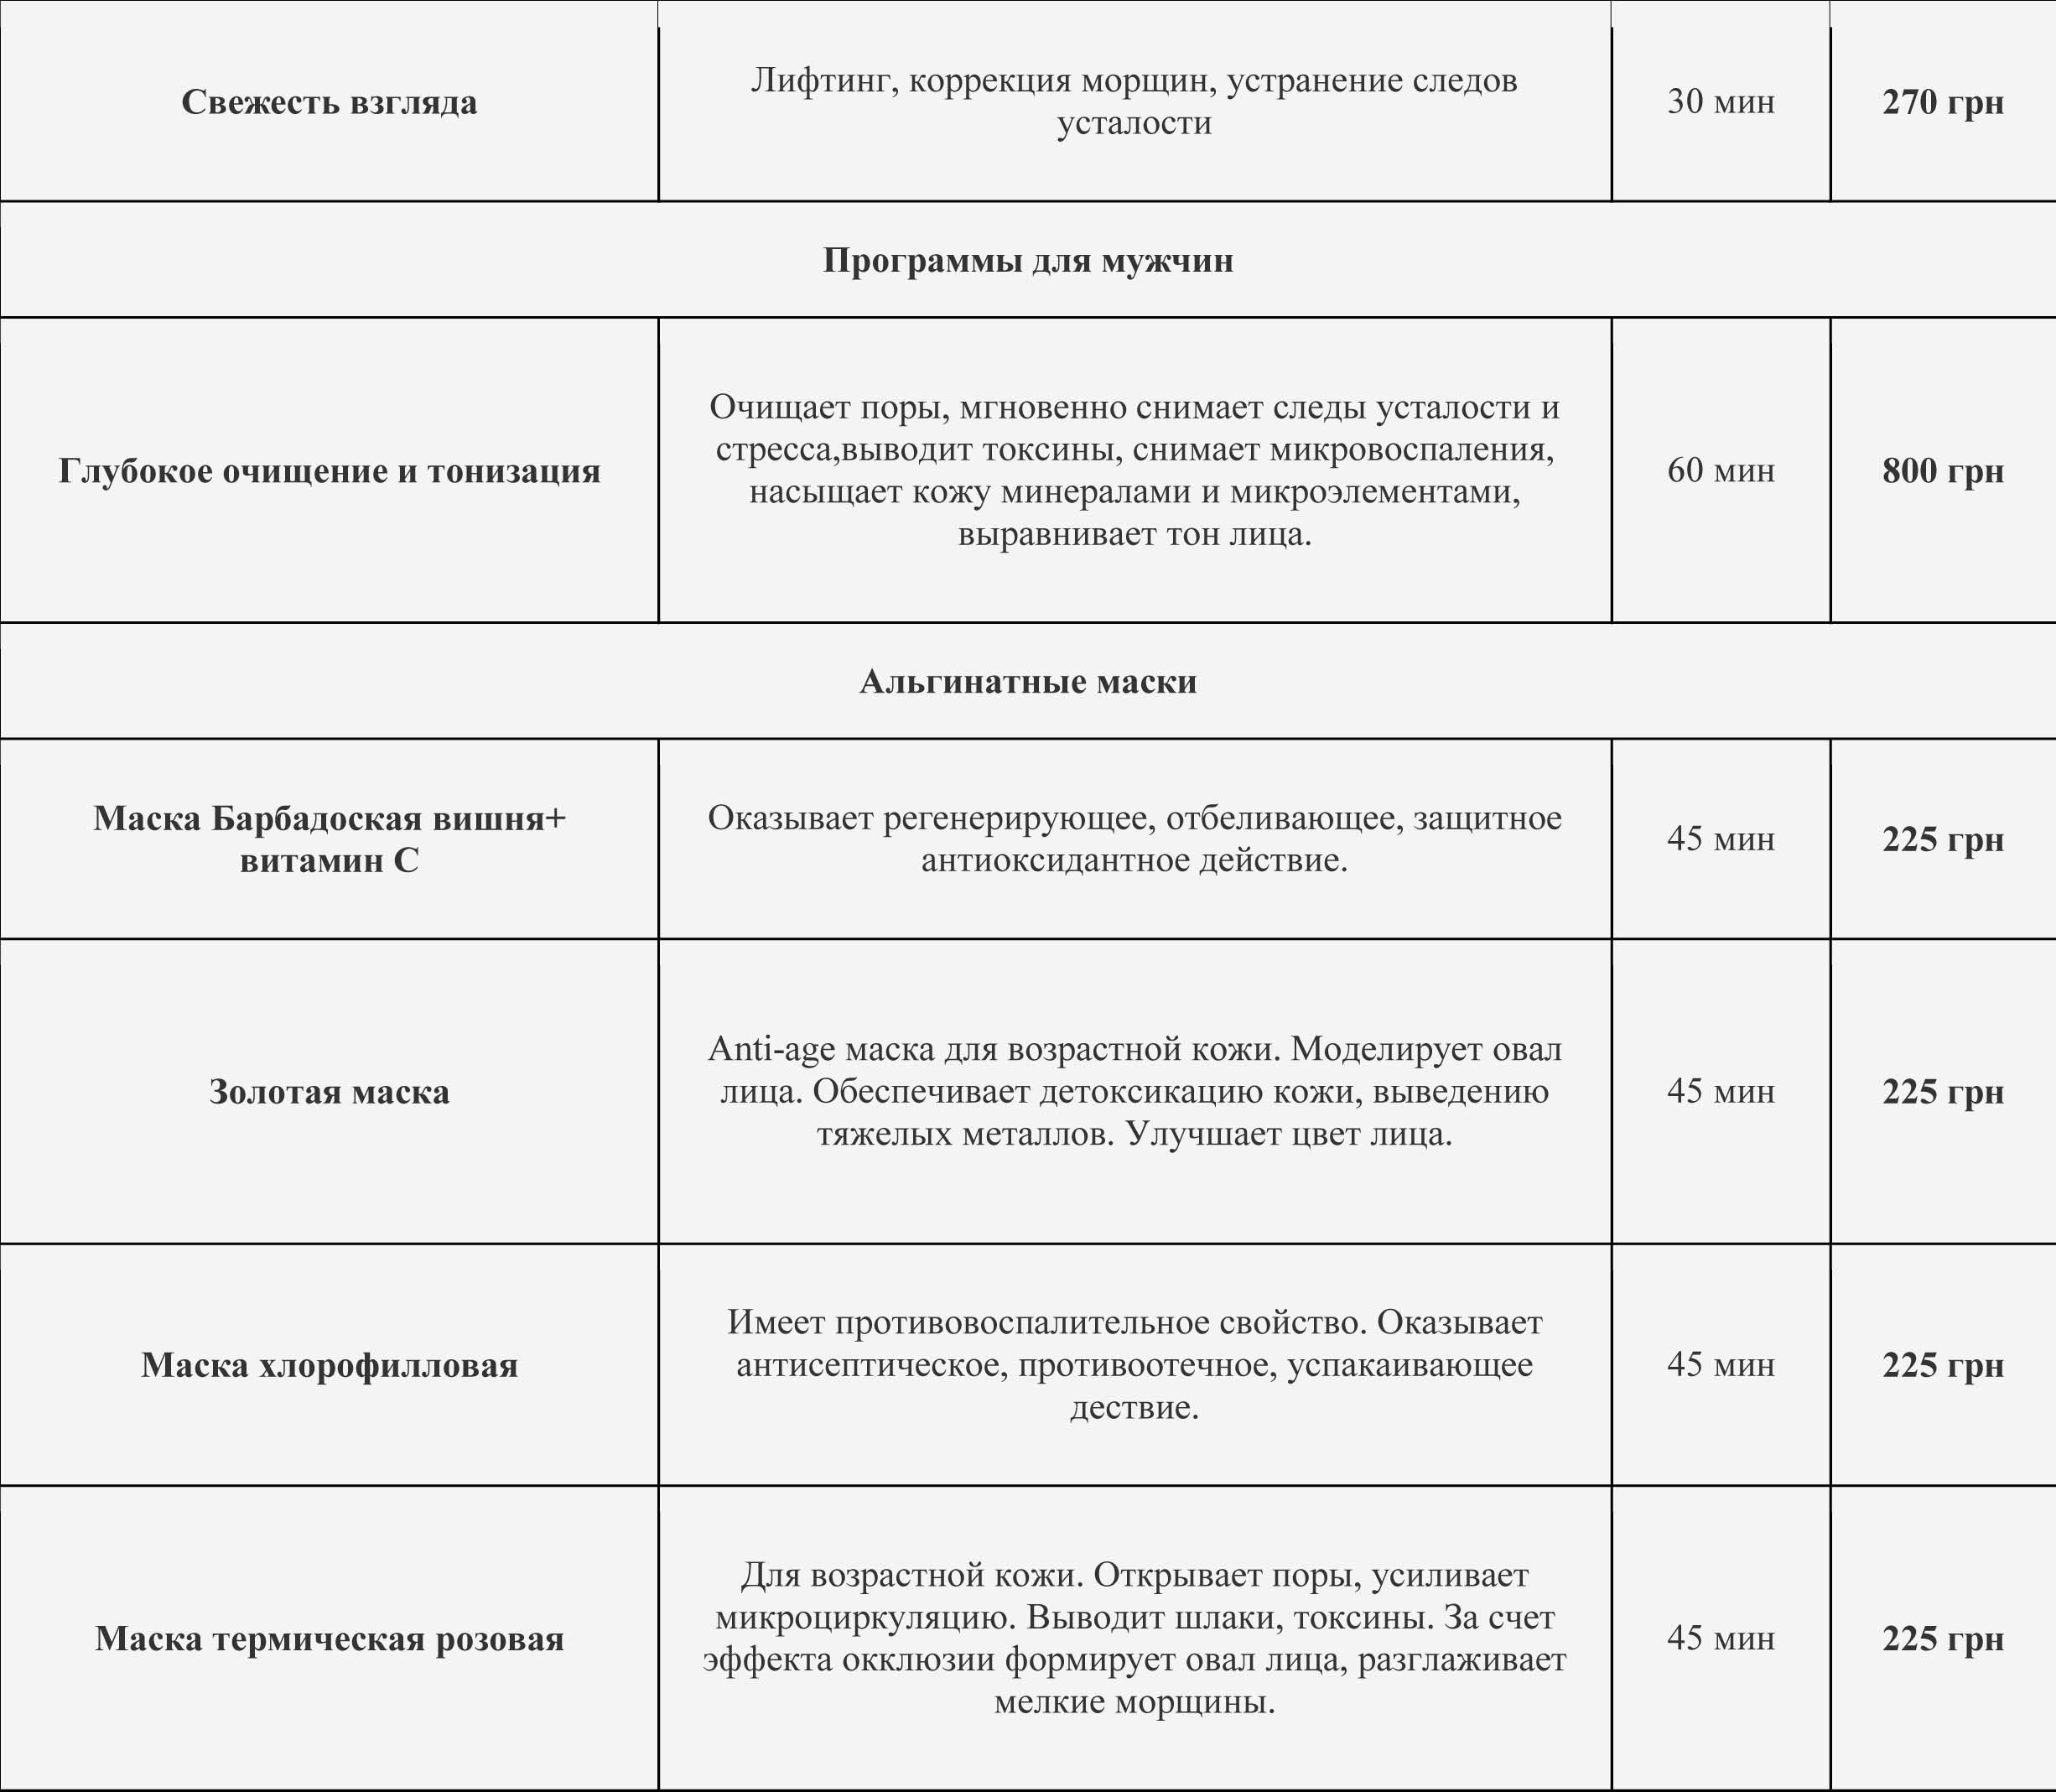 kosmetolog-3